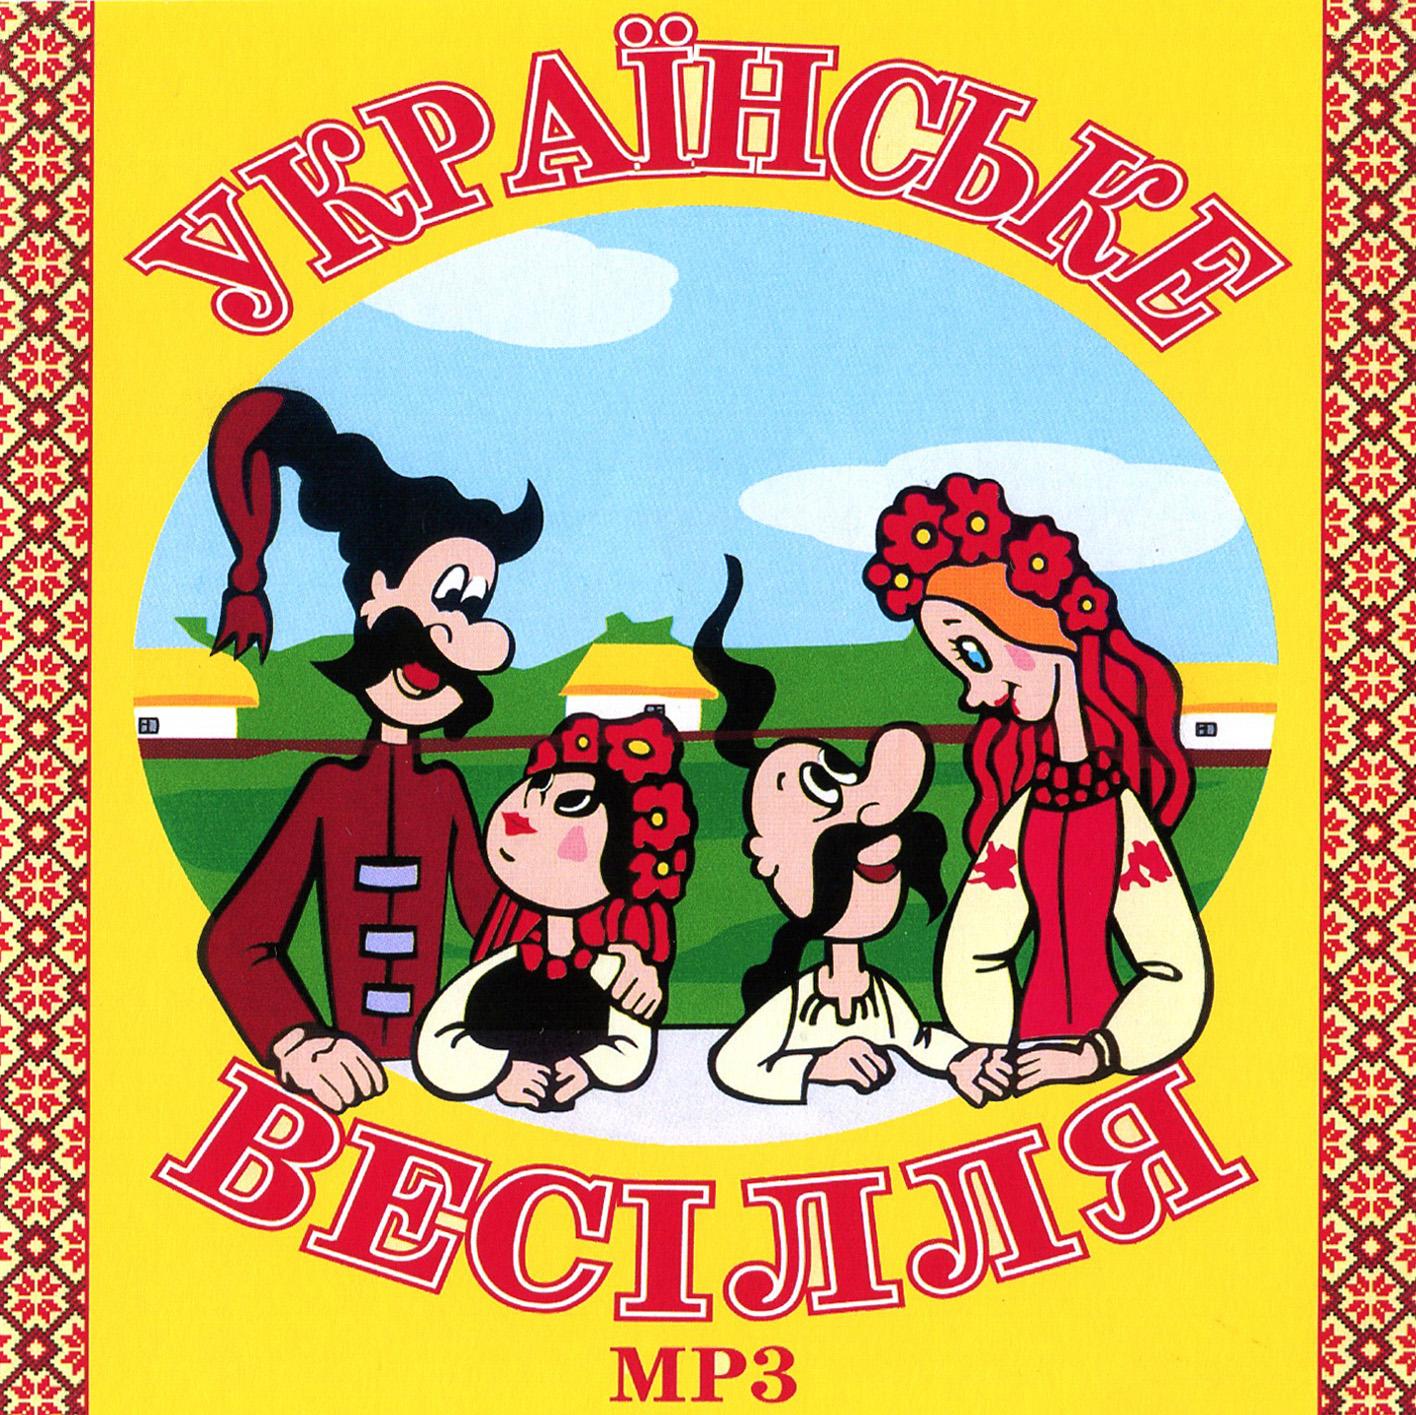 Українське весілля [mp3]